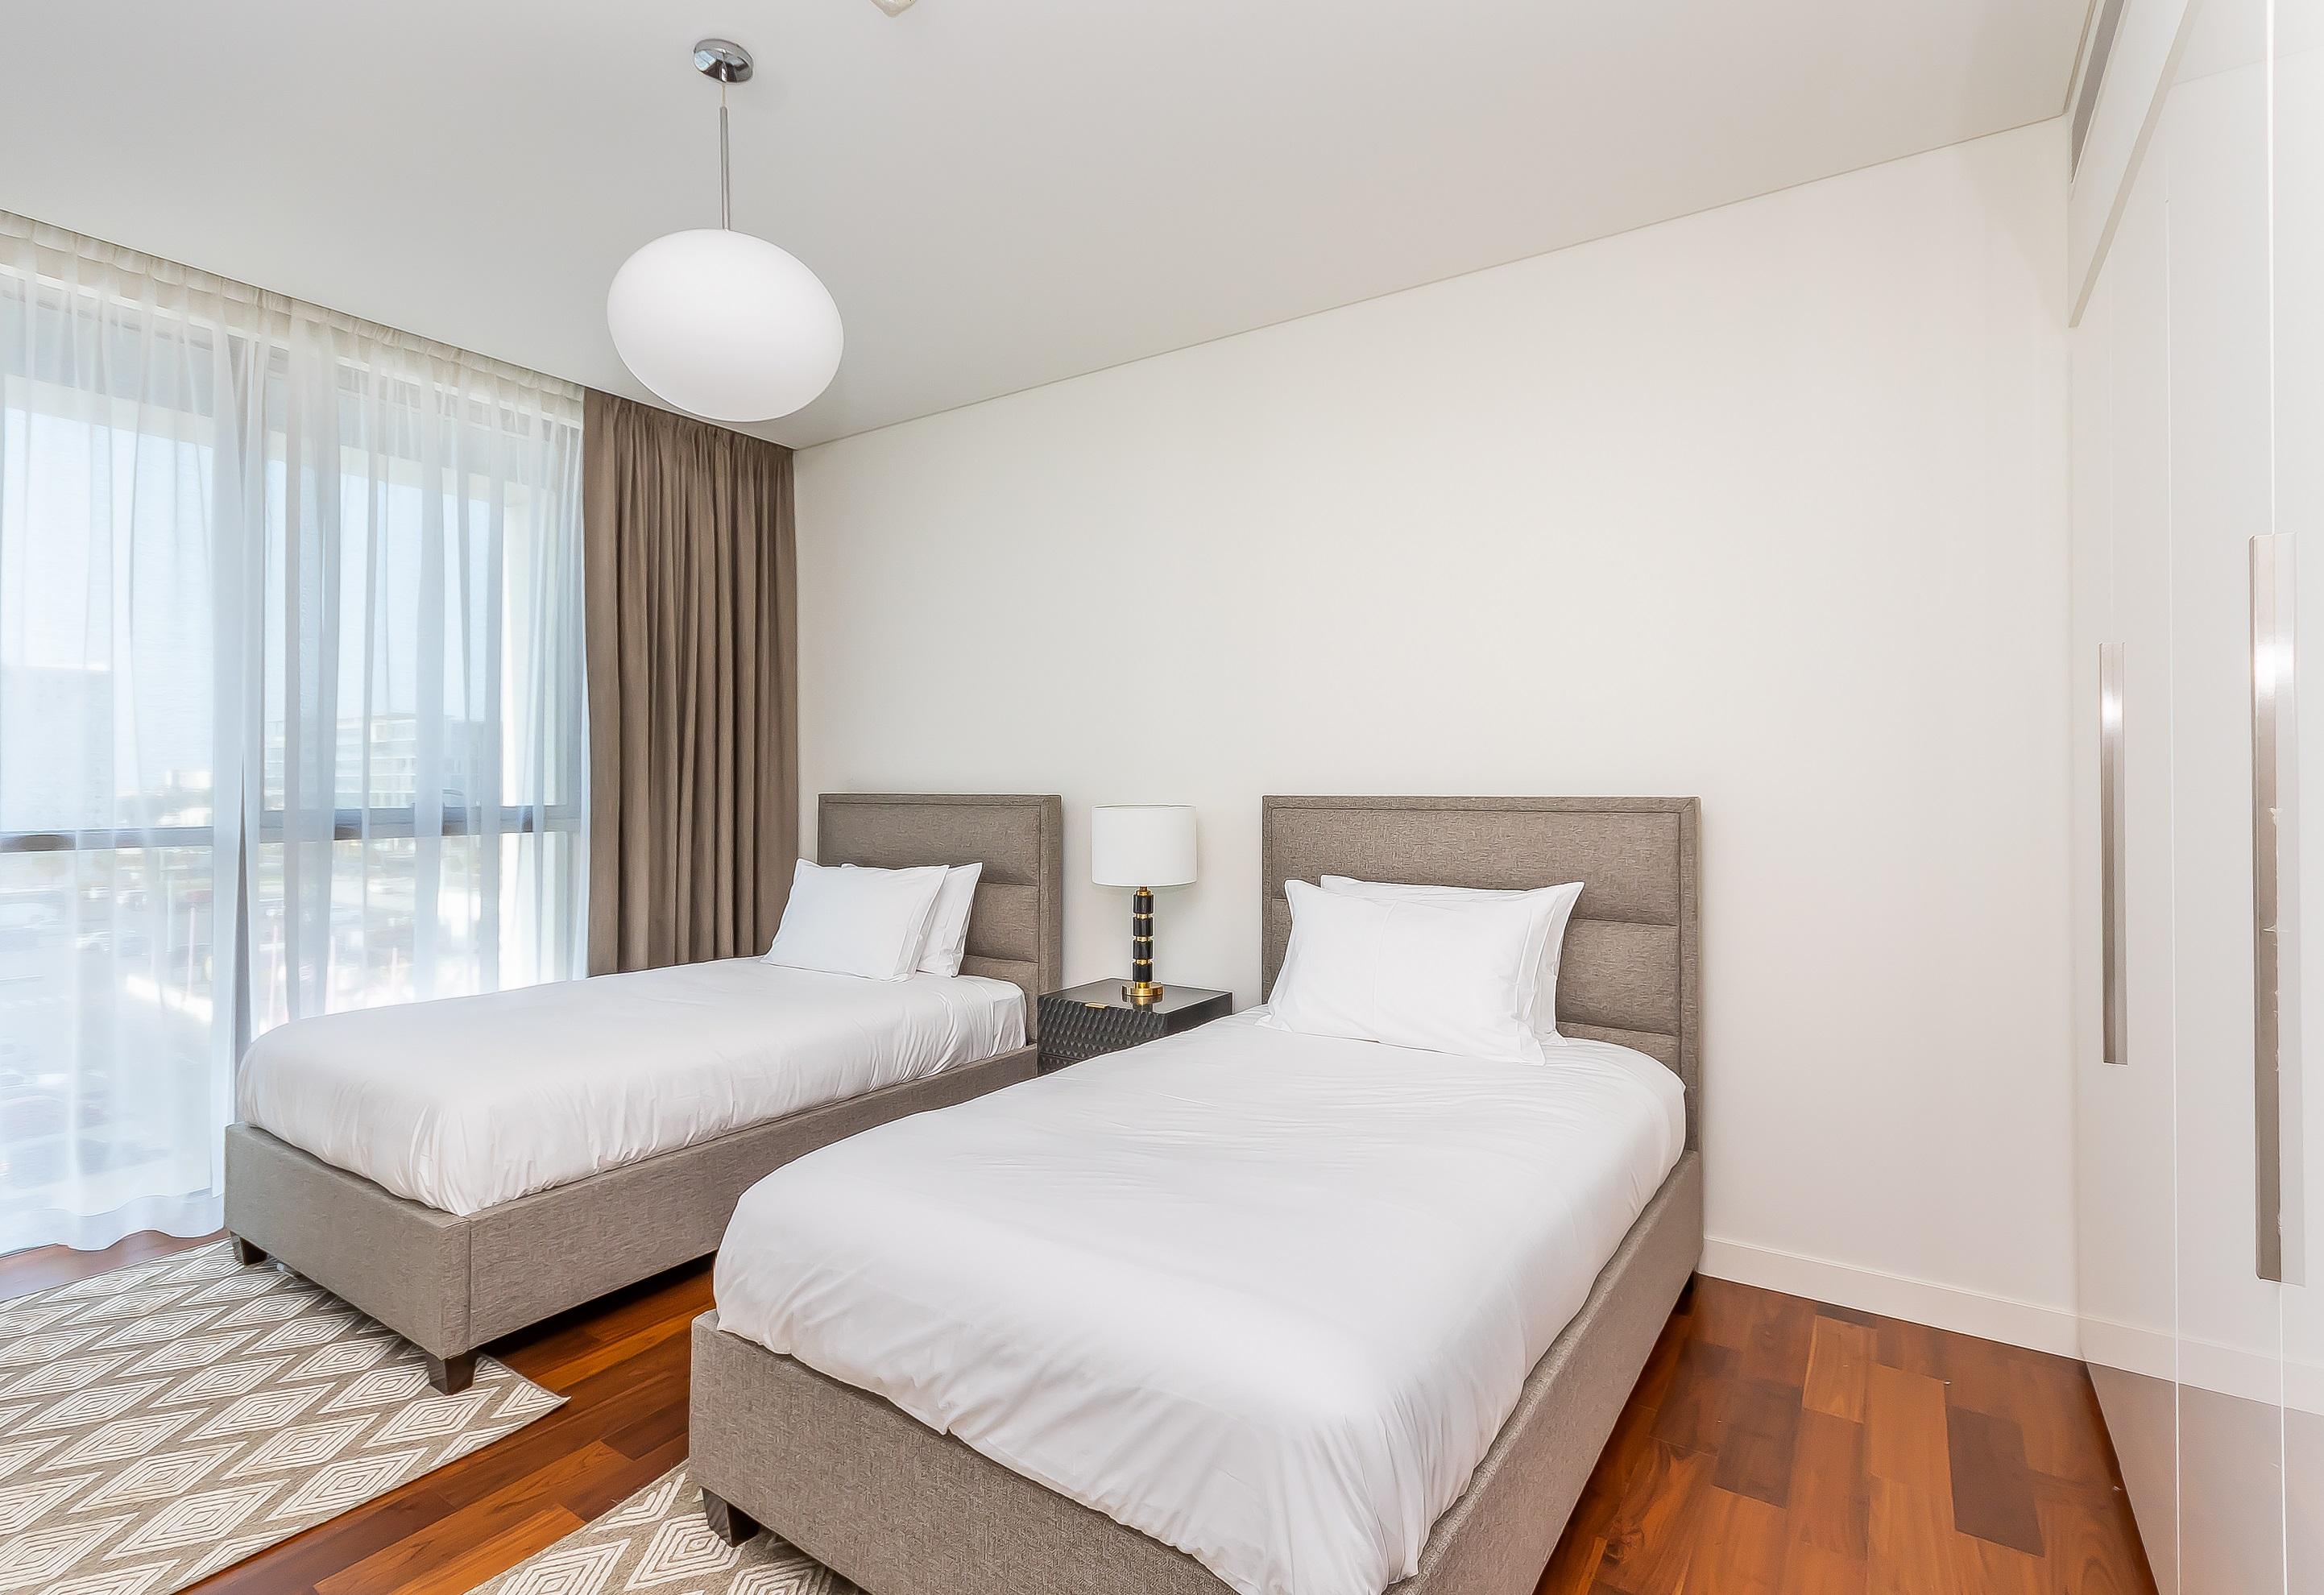 Apartment  Remarkable Value   Unbeatable Location  3 Beds City Walk B 10 309 photo 24142315